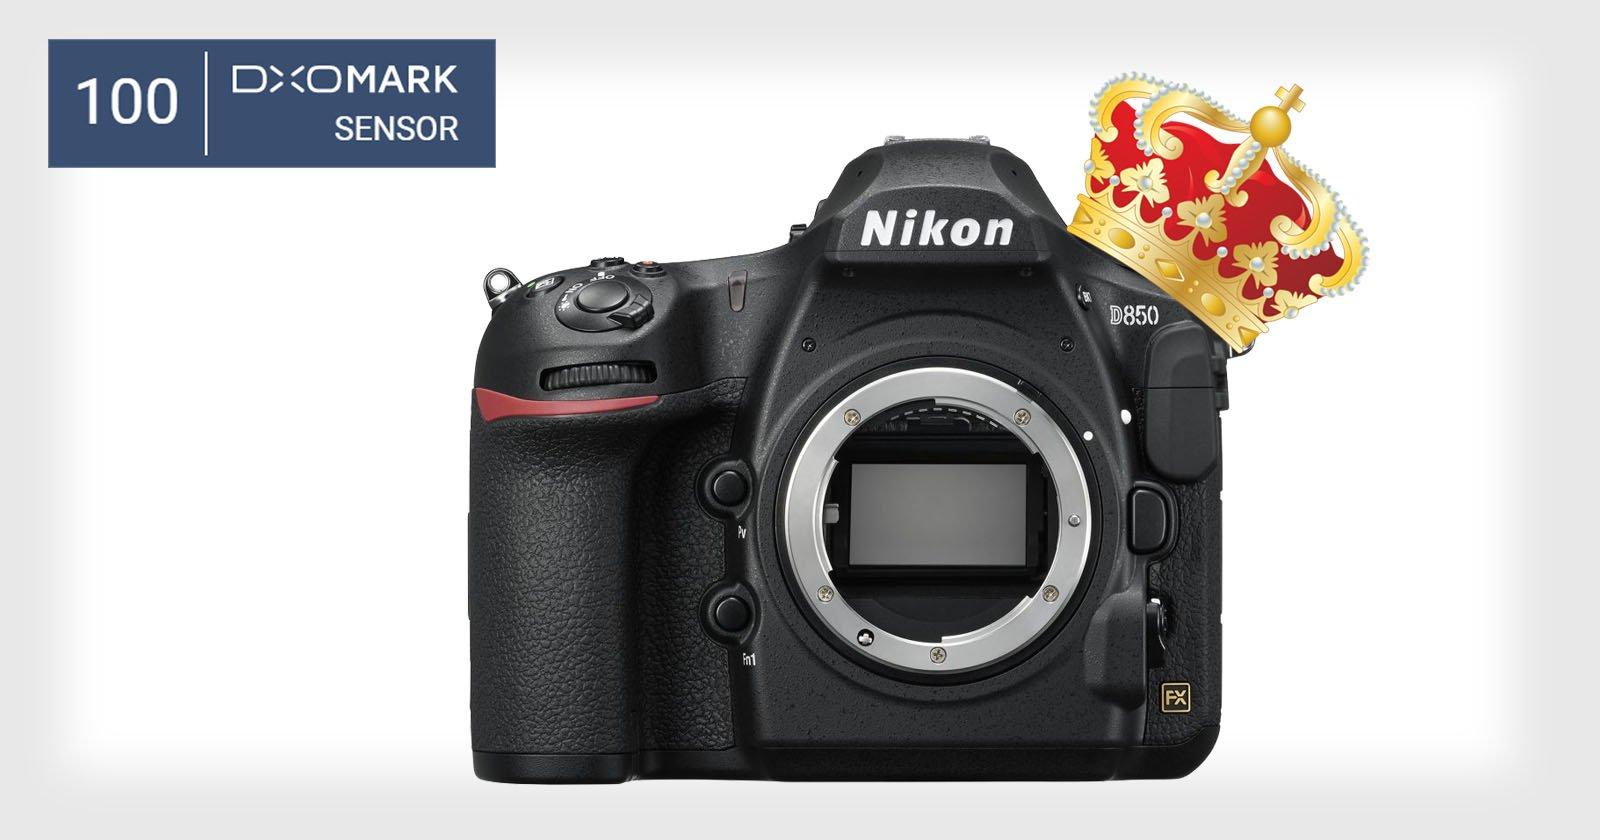 Nikon D850 Best DSLR Ever, Gets First Full 100 Score at DxOMark